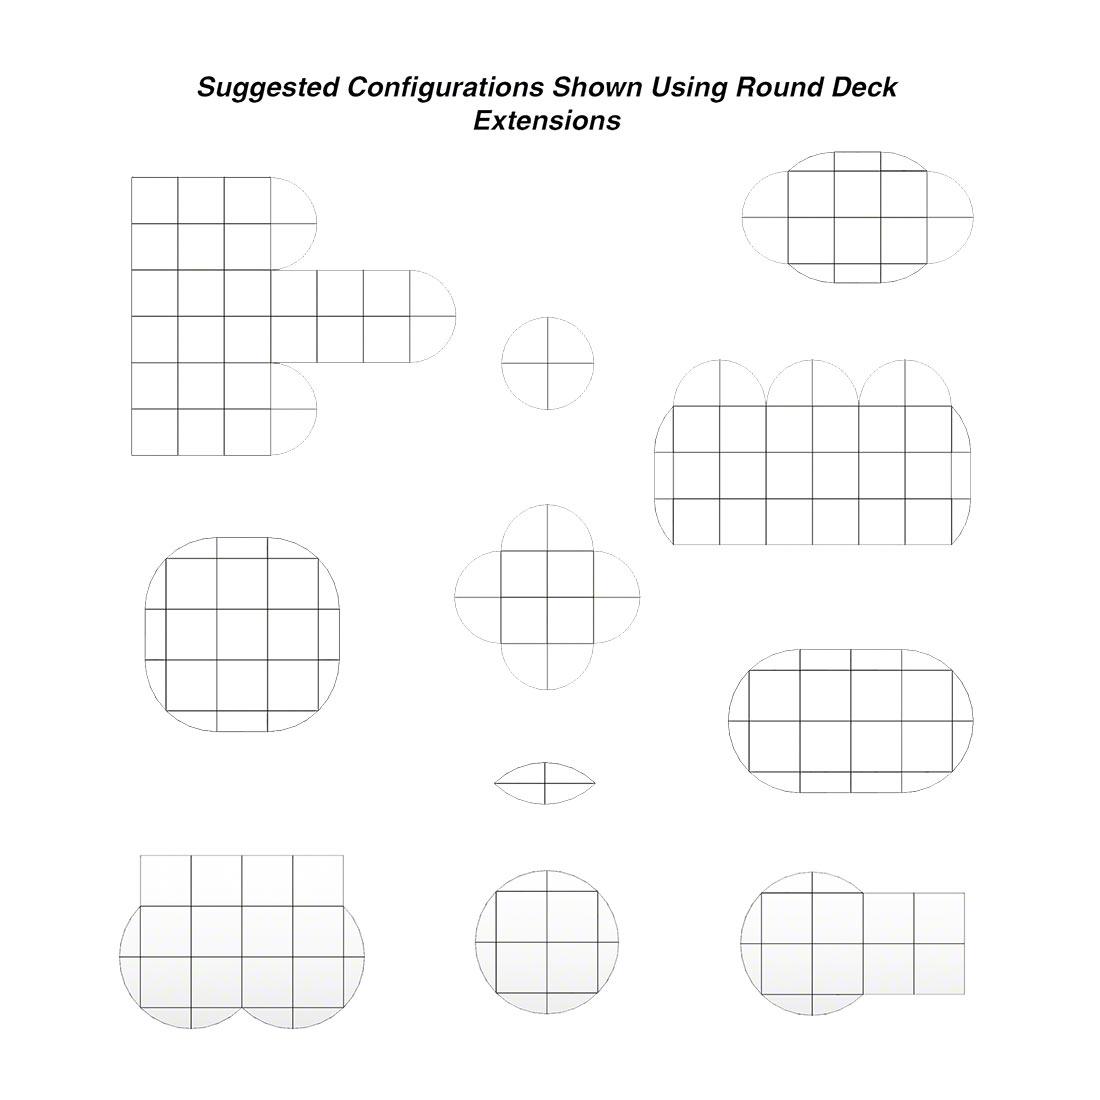 Biljax ST8100 Round Deck Steel Frame Stage Sections #BJX-0106-3 ...